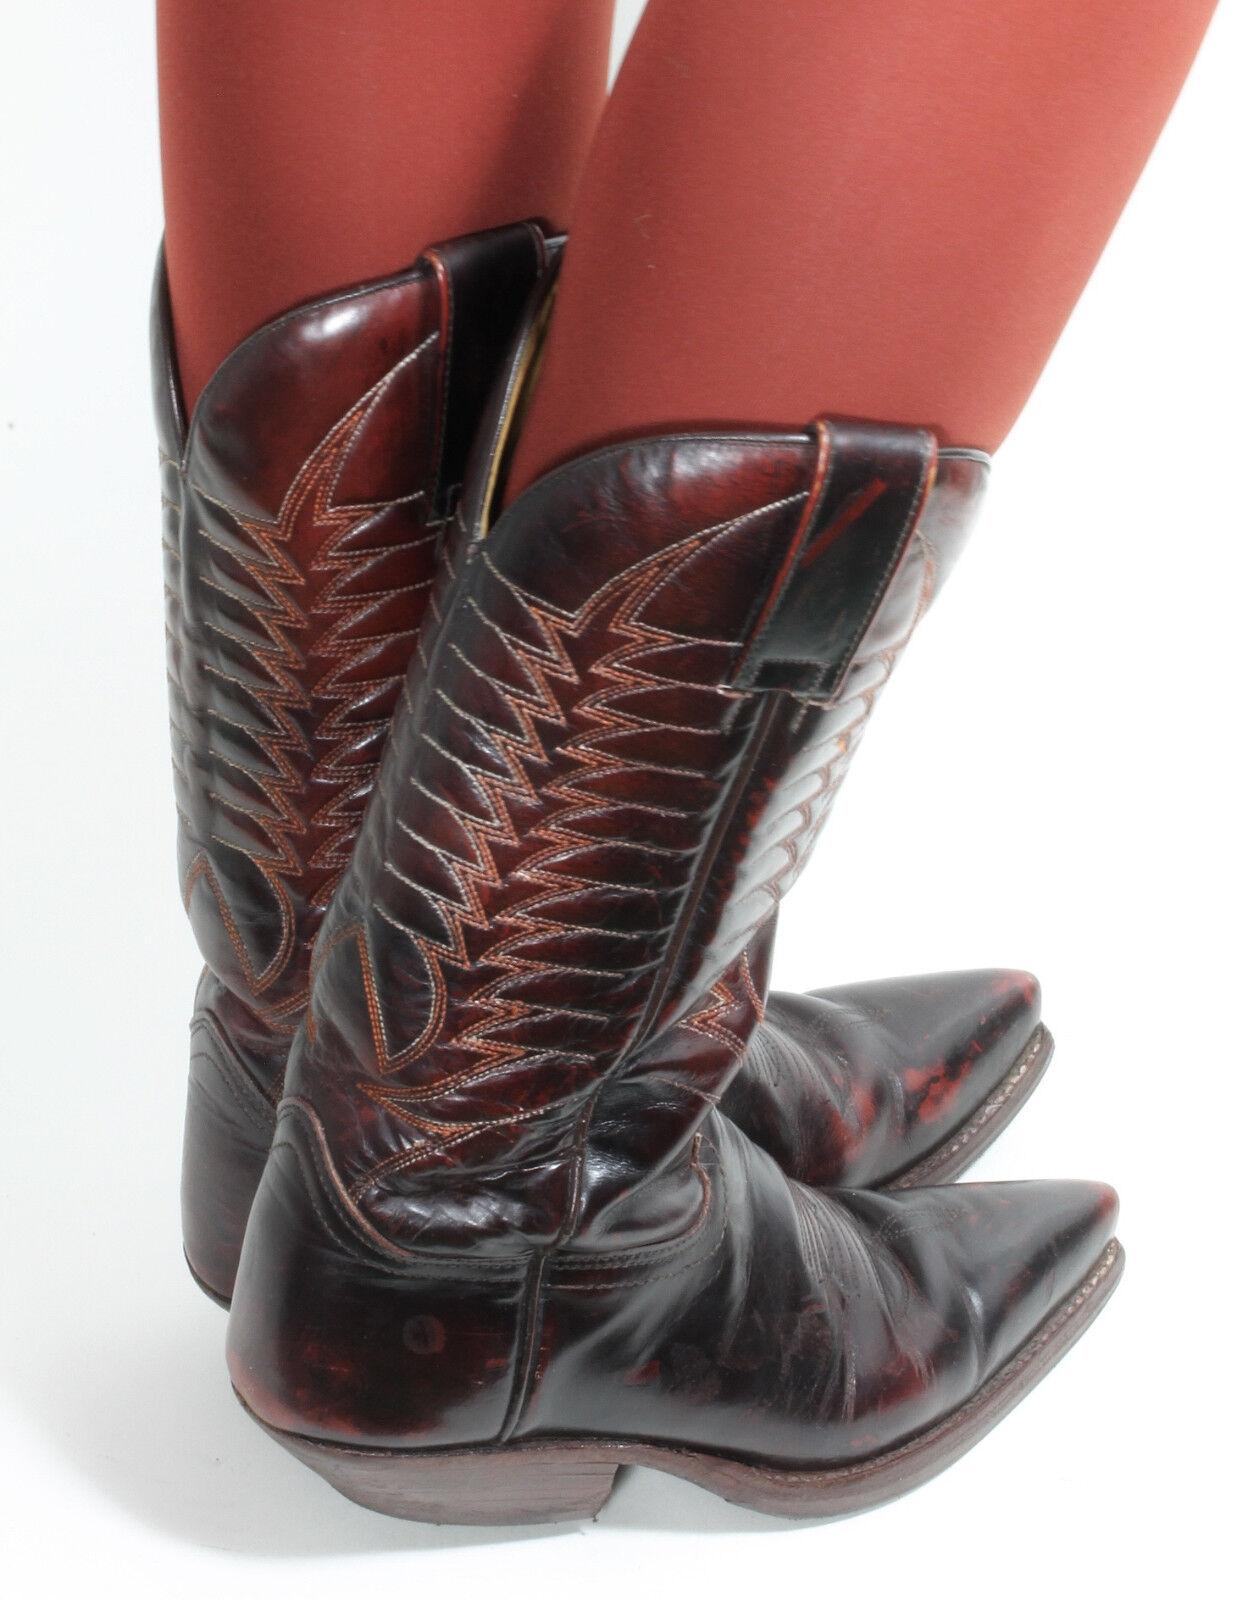 Westernstiefel Cowboystiefel Catalan Line Style Line Catalan Dance Texas Mosquito Stiefel 37 dd3632